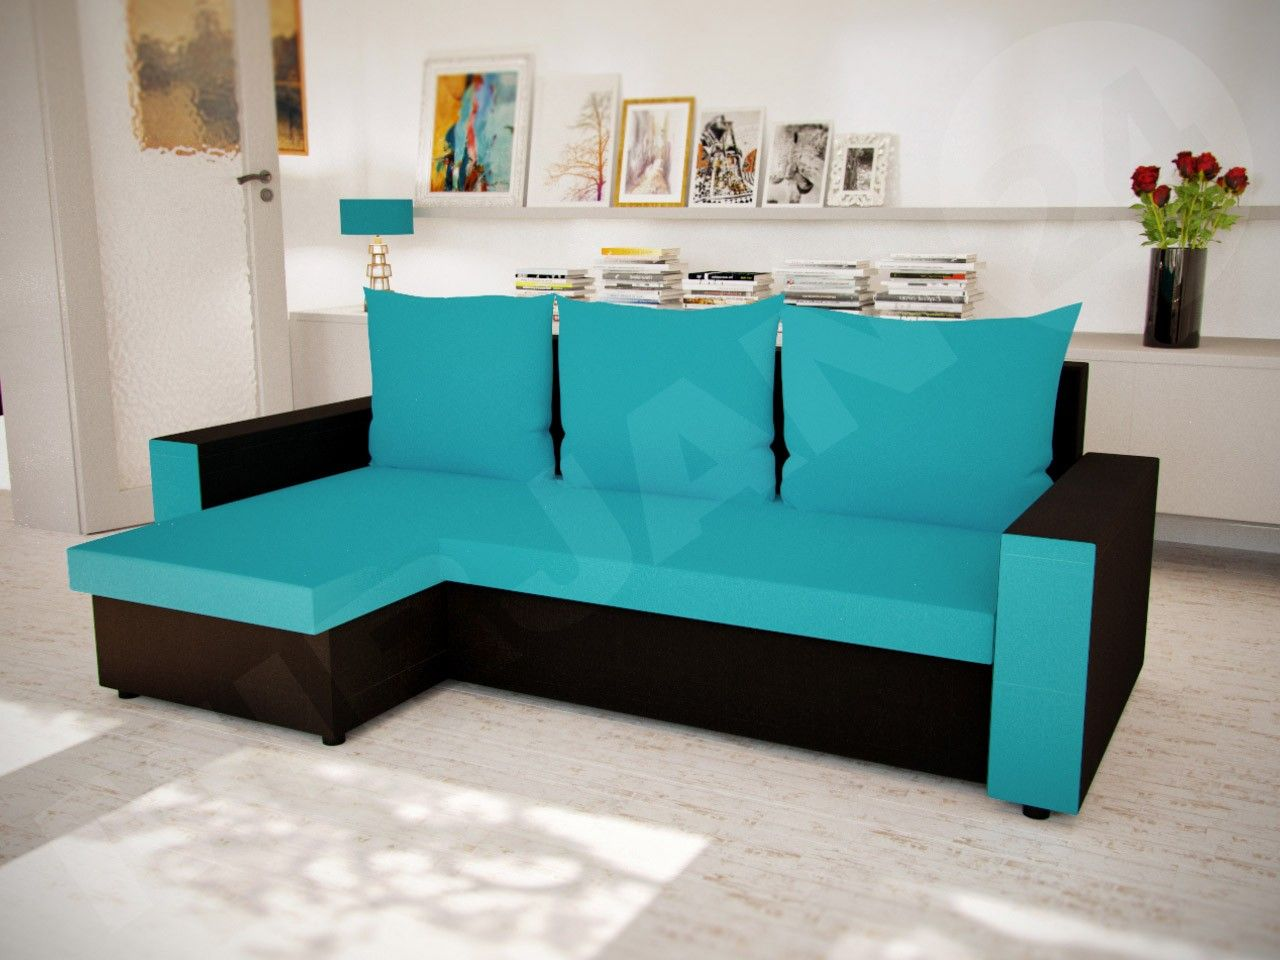 Explore Corner Sofa, The Shade And More!